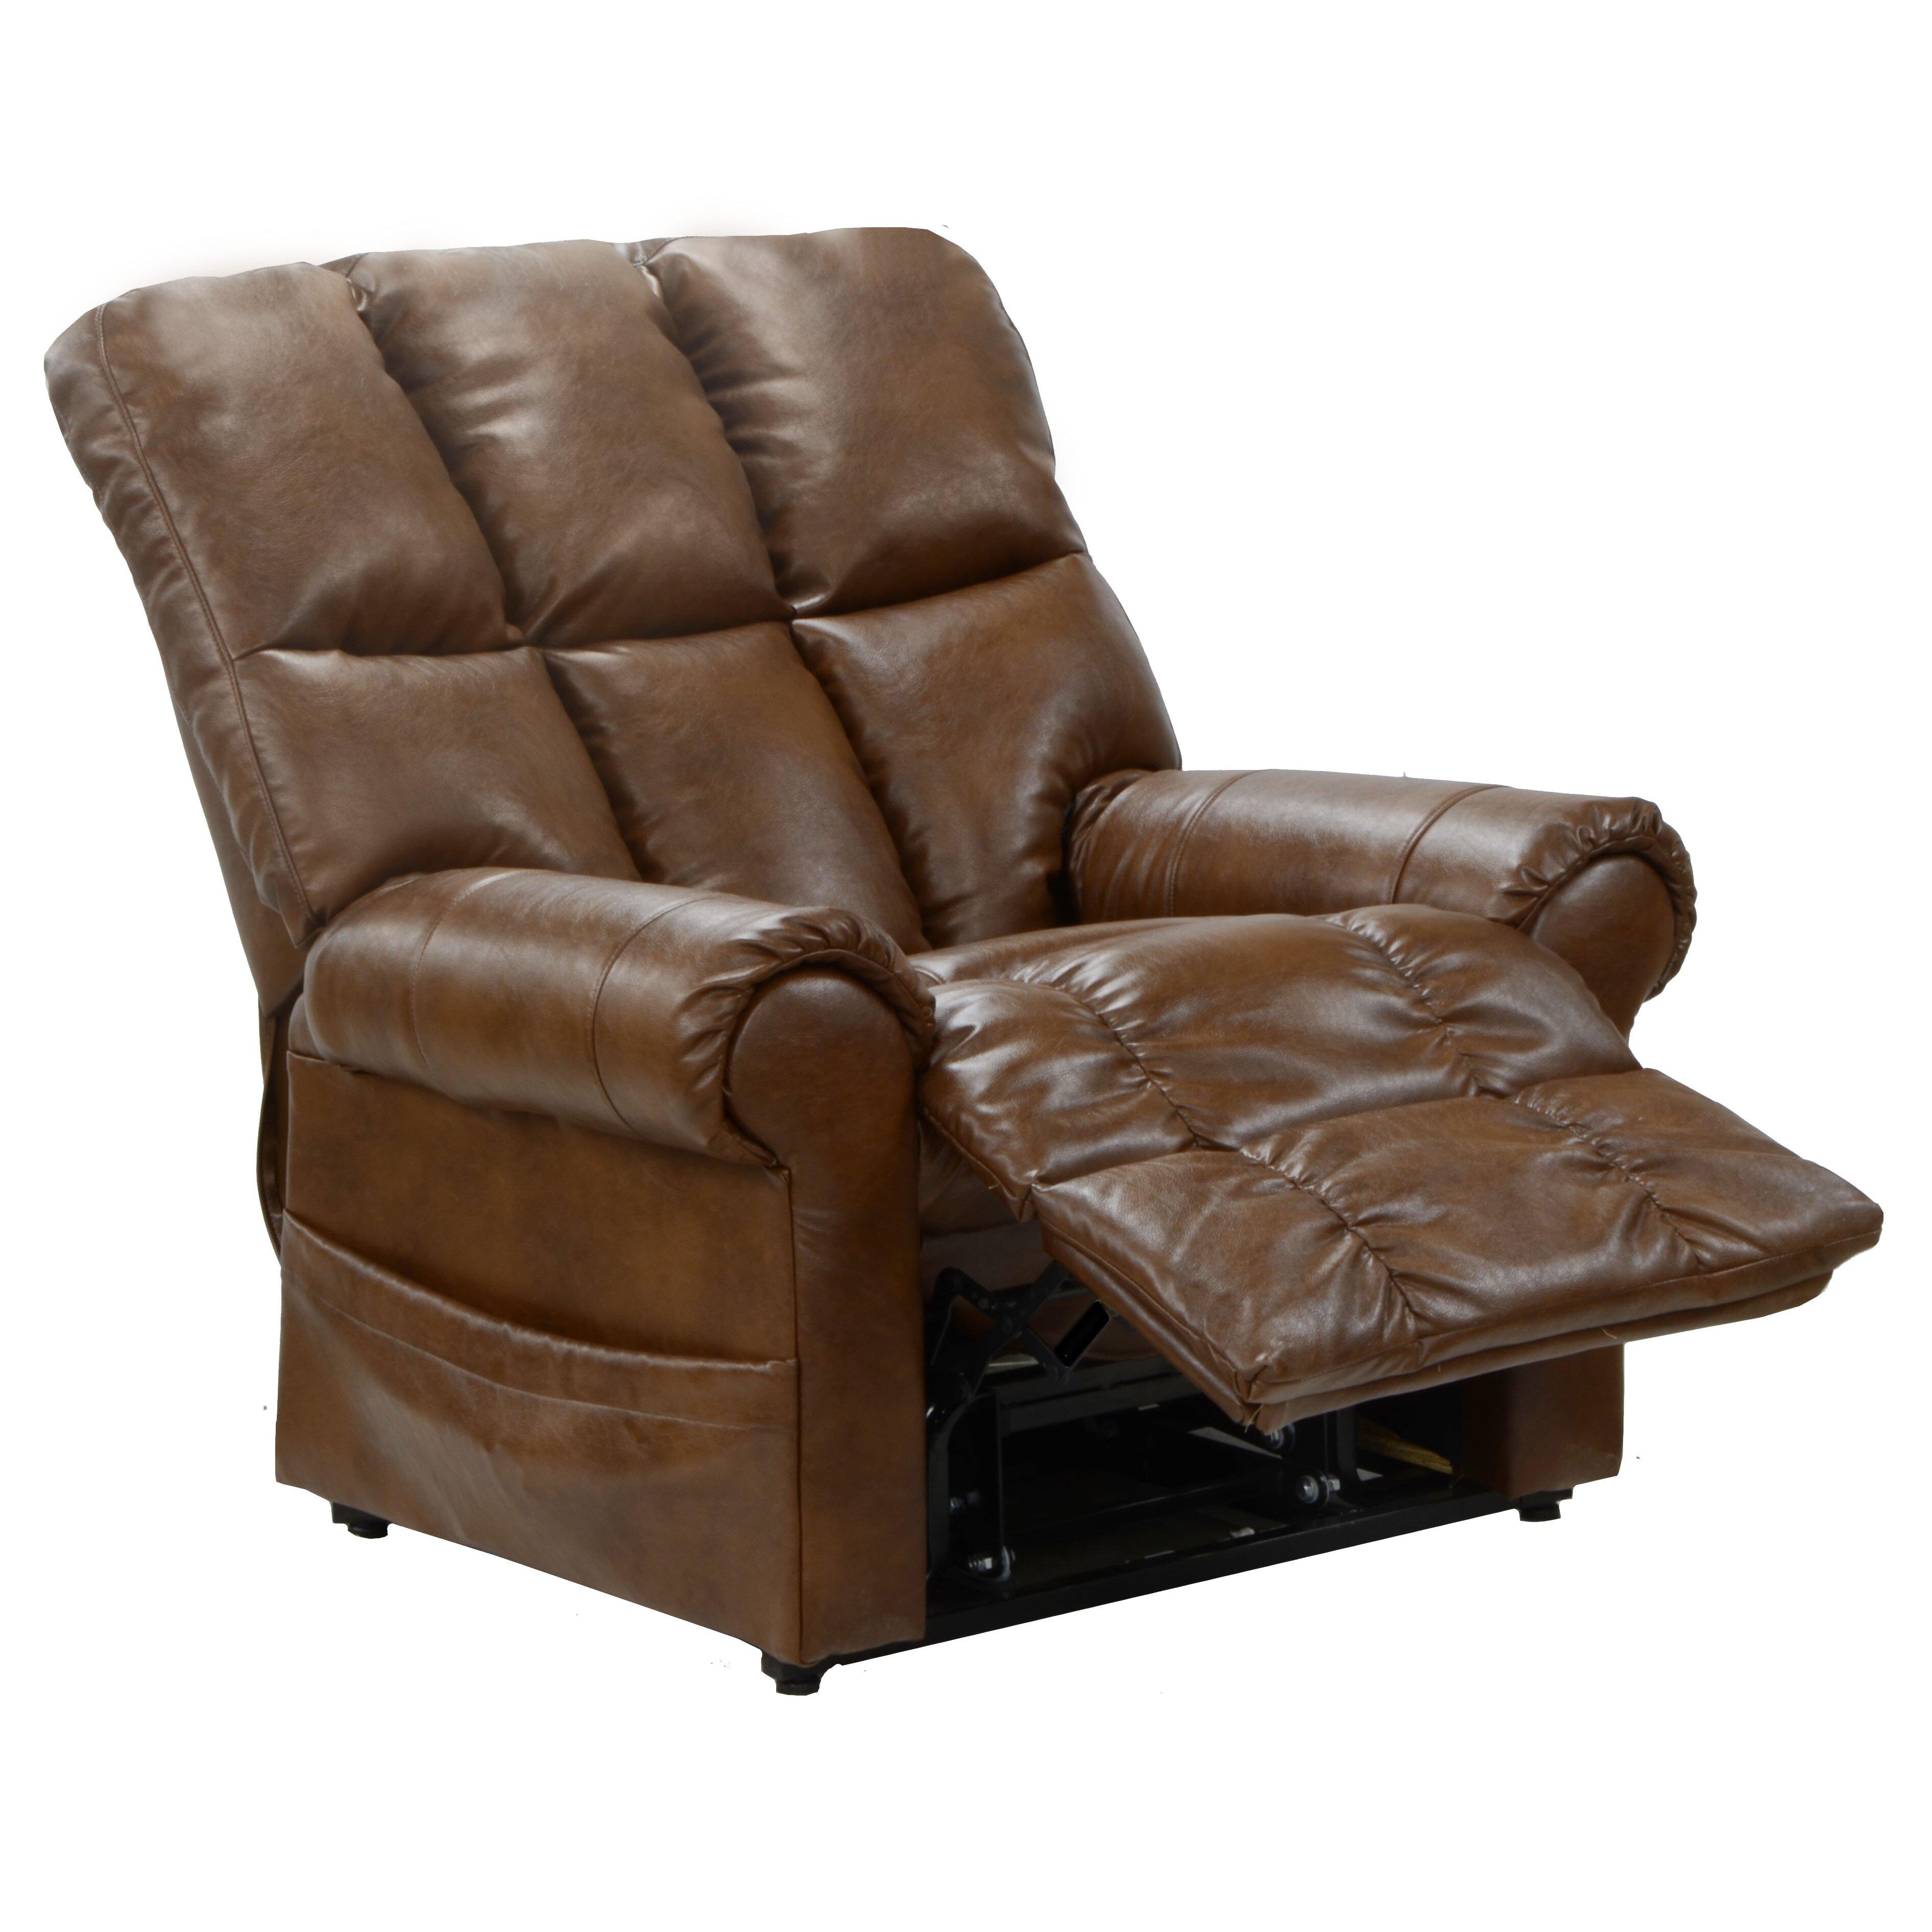 Catnapper stallworth lift chair reviews wayfair - Catnapper lift chairs recliners ...